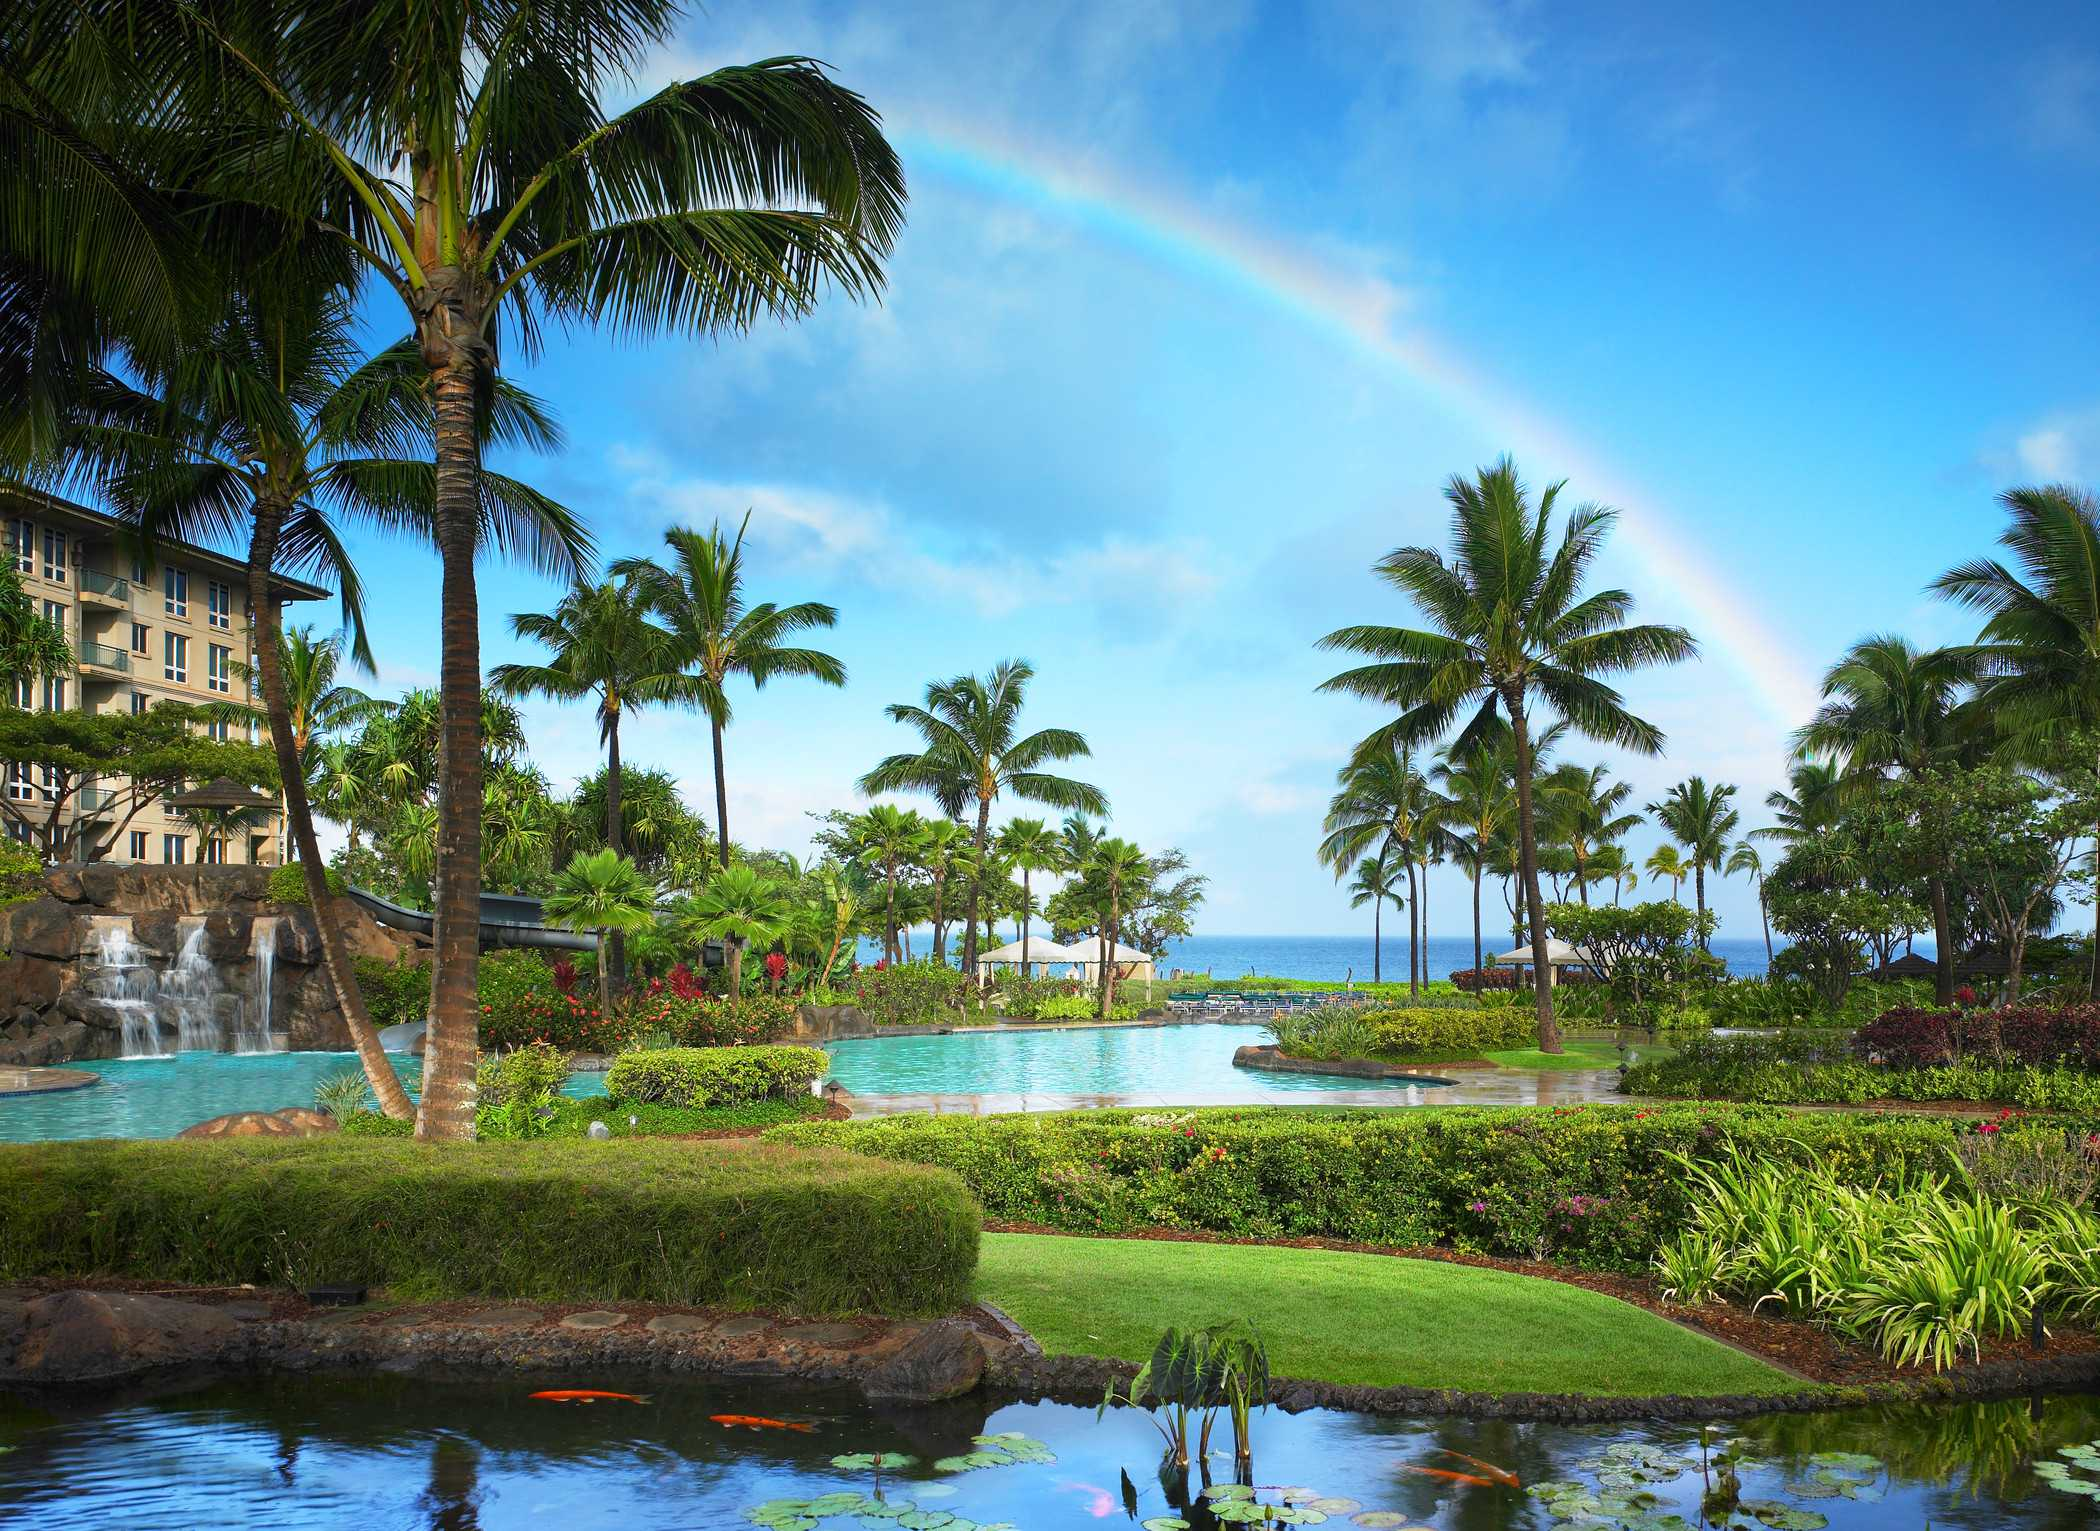 Westin Kaanapali Ocean Resort Foreclosure Update